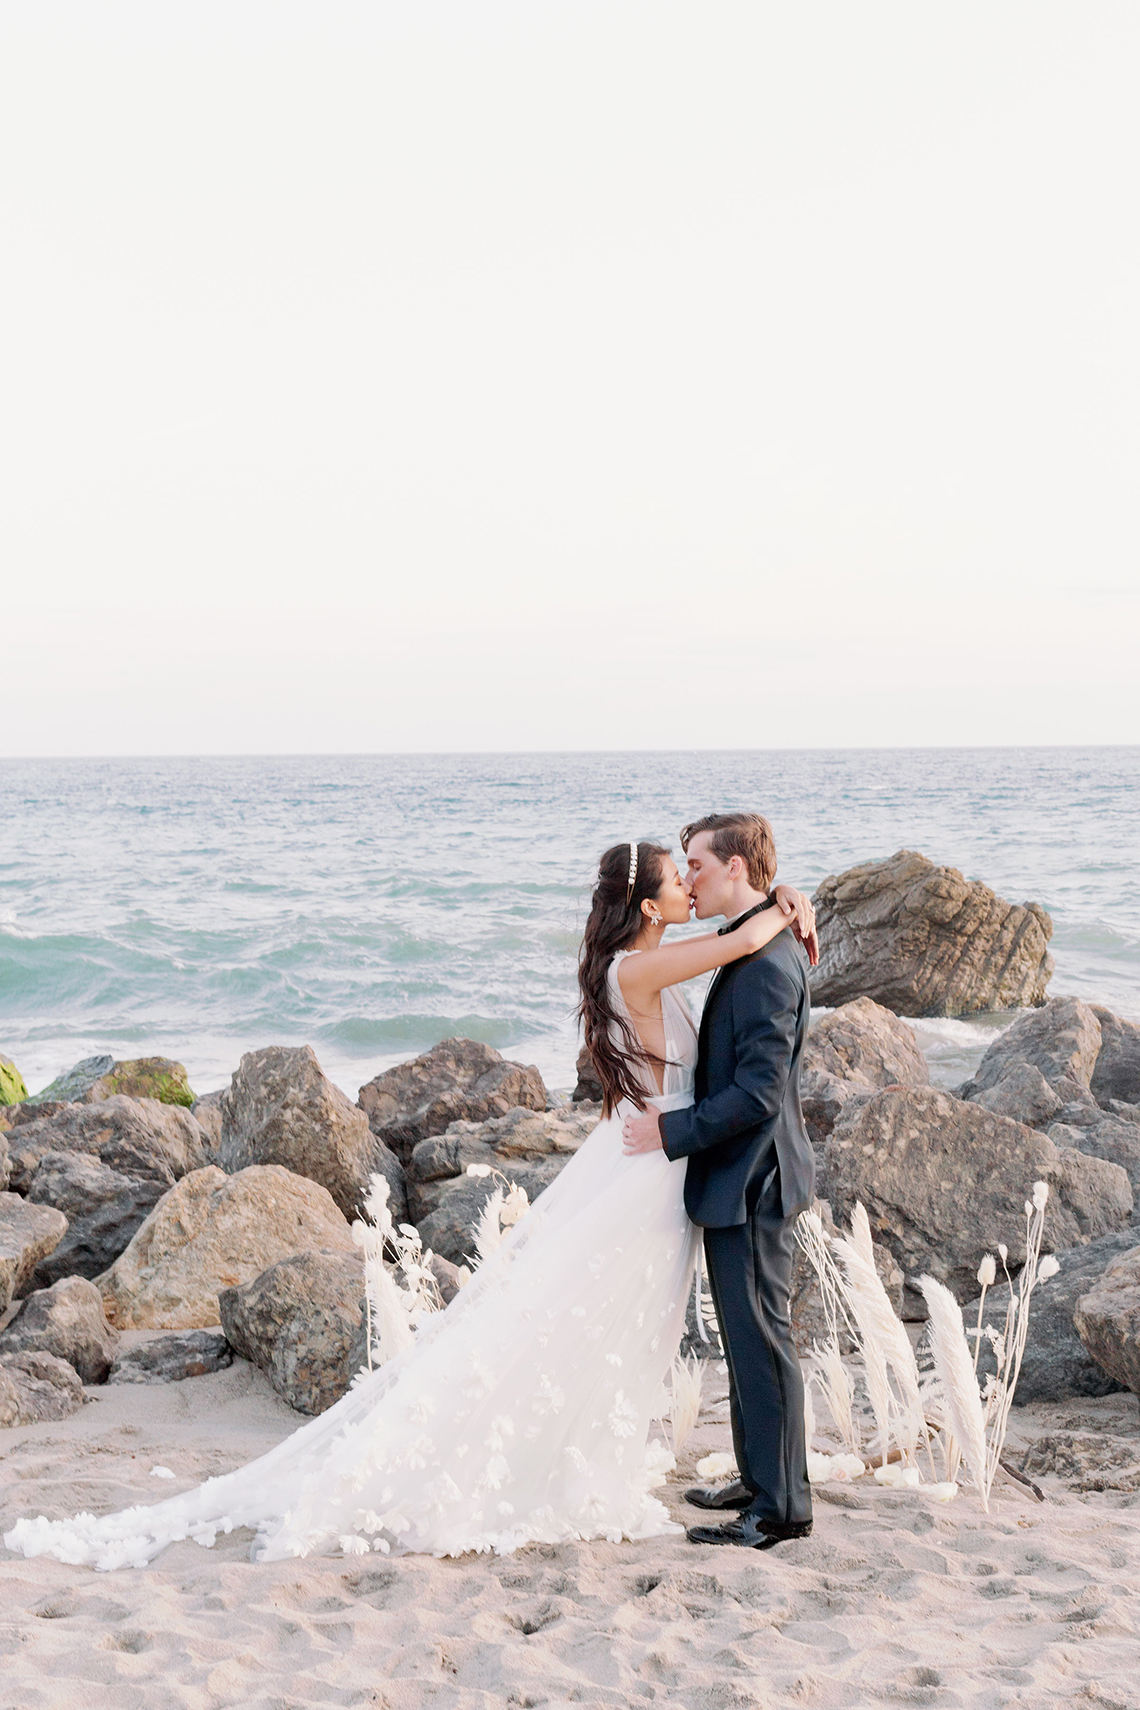 Ethereal Malibu Beach Wedding Inspiration – Courage and Dash Photo 13